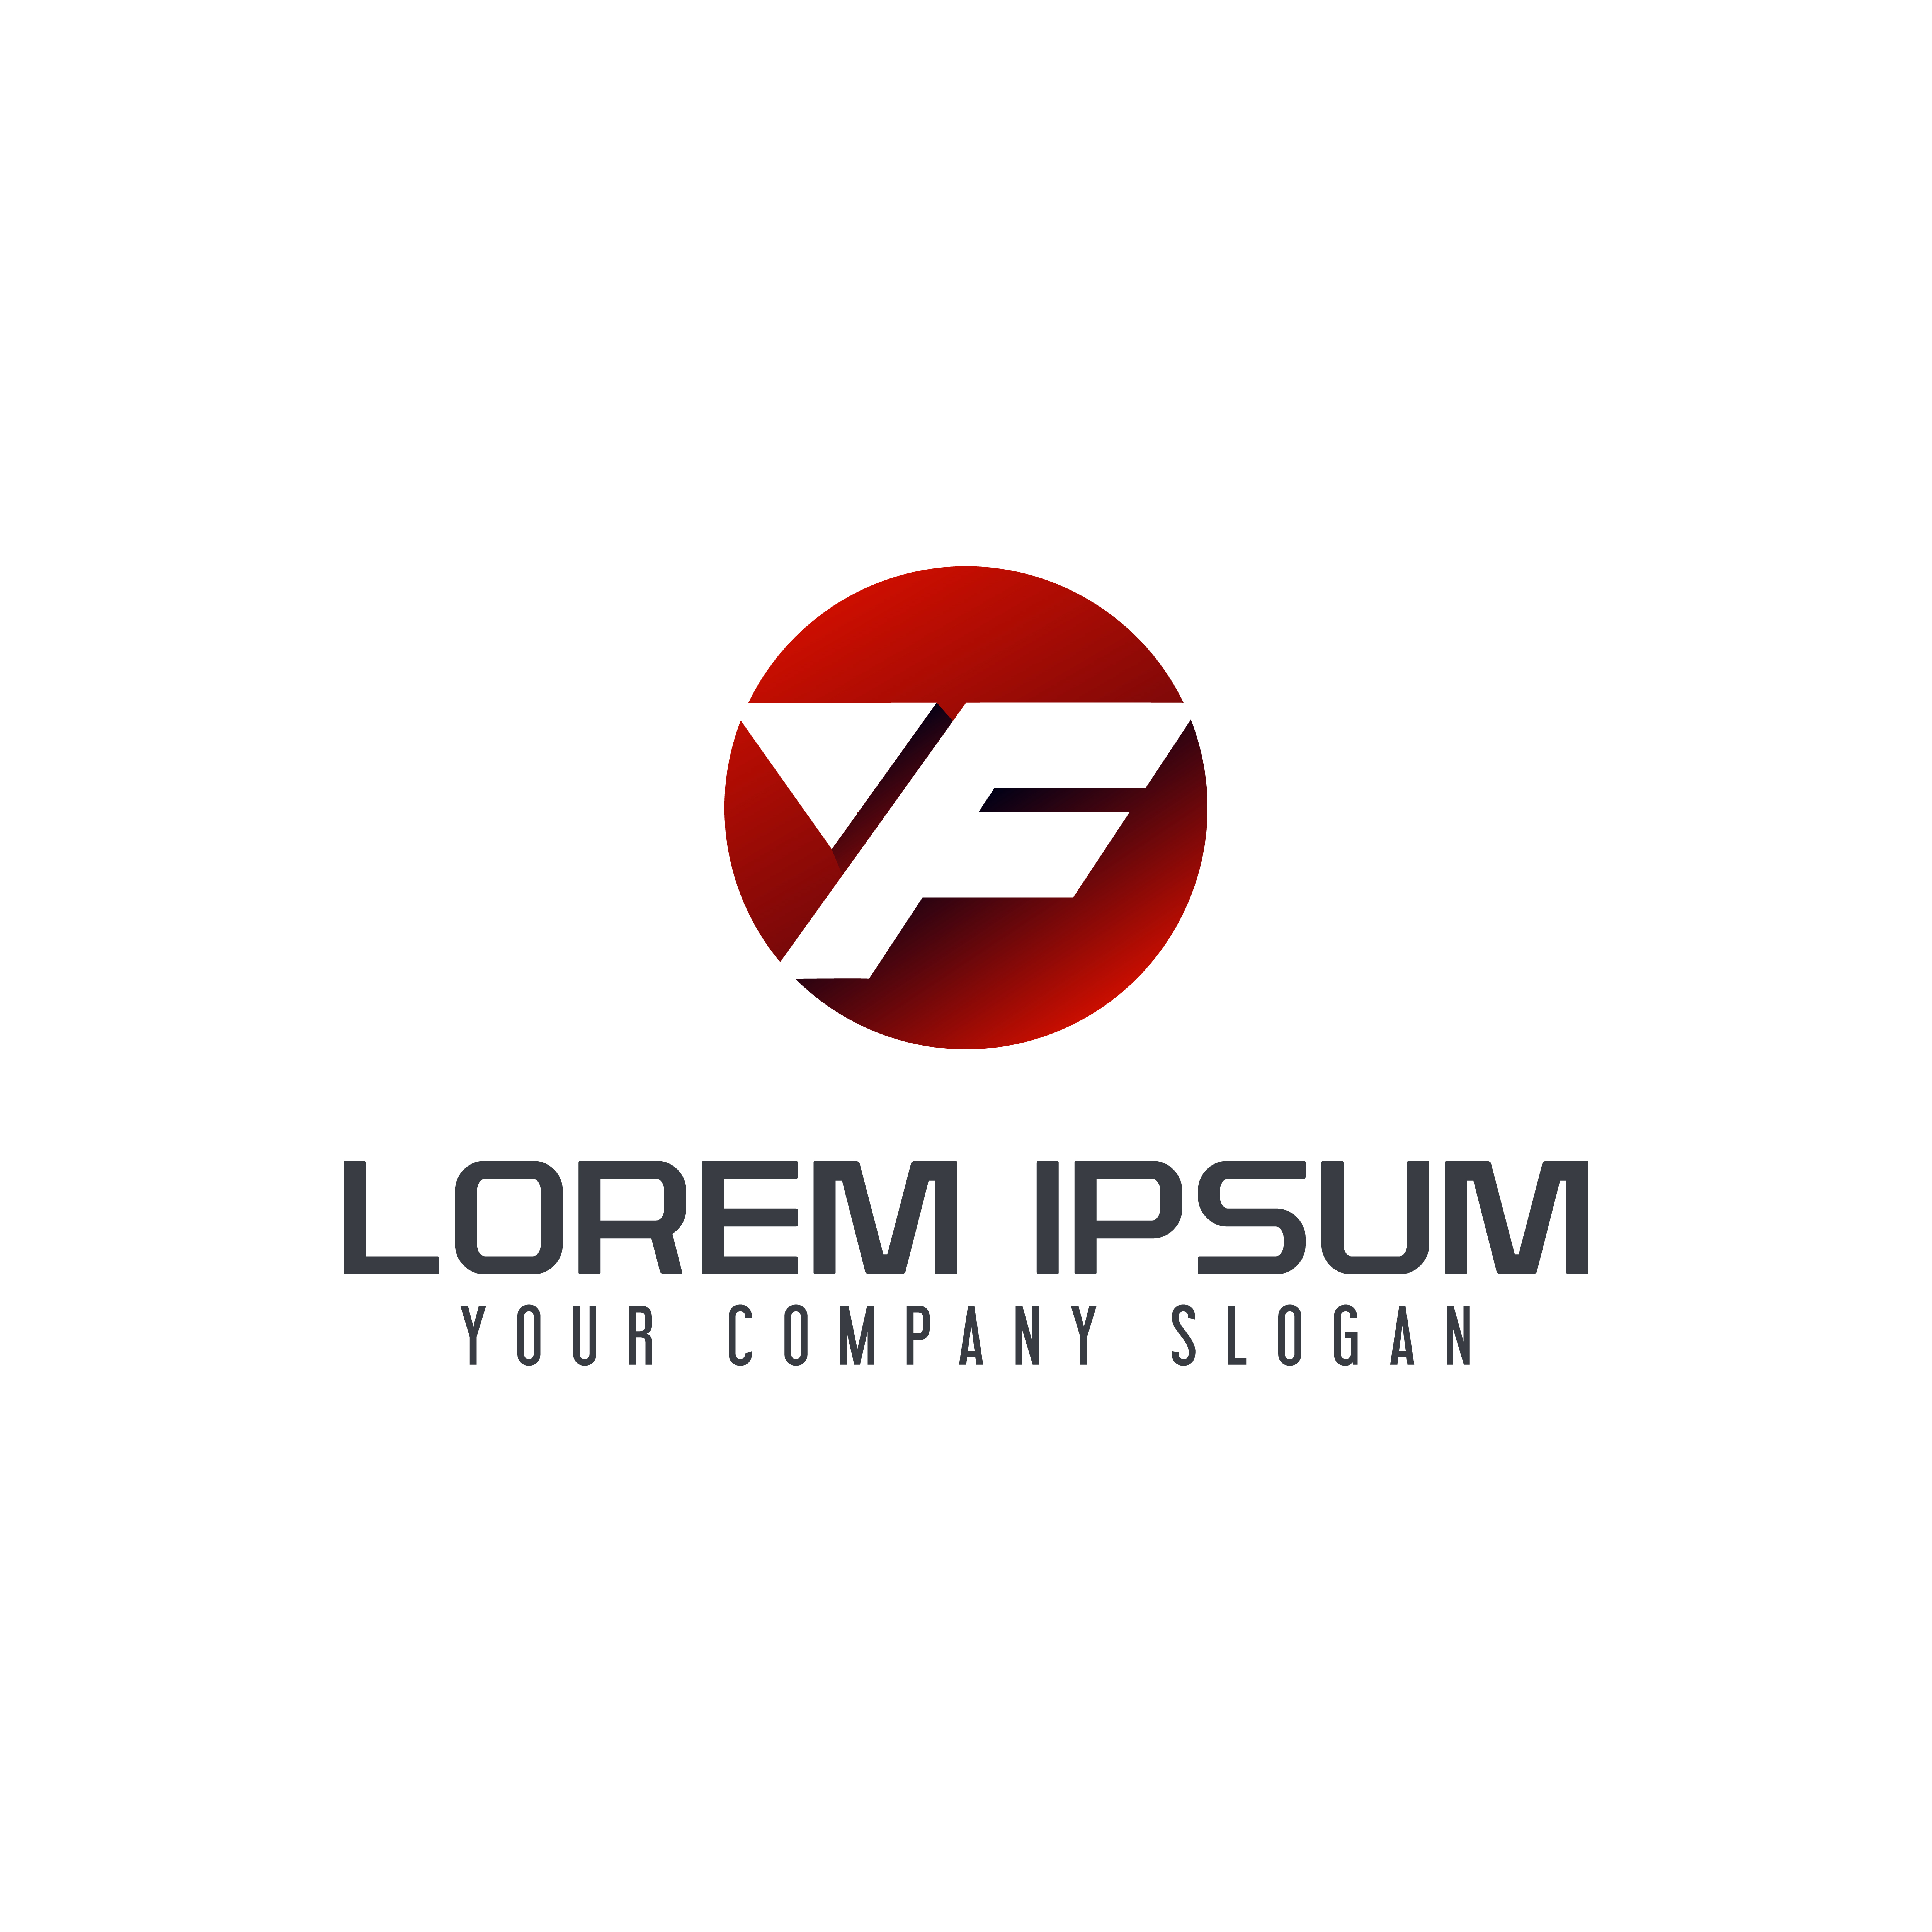 Letter F Modern Logo. Circle Design Concept Template